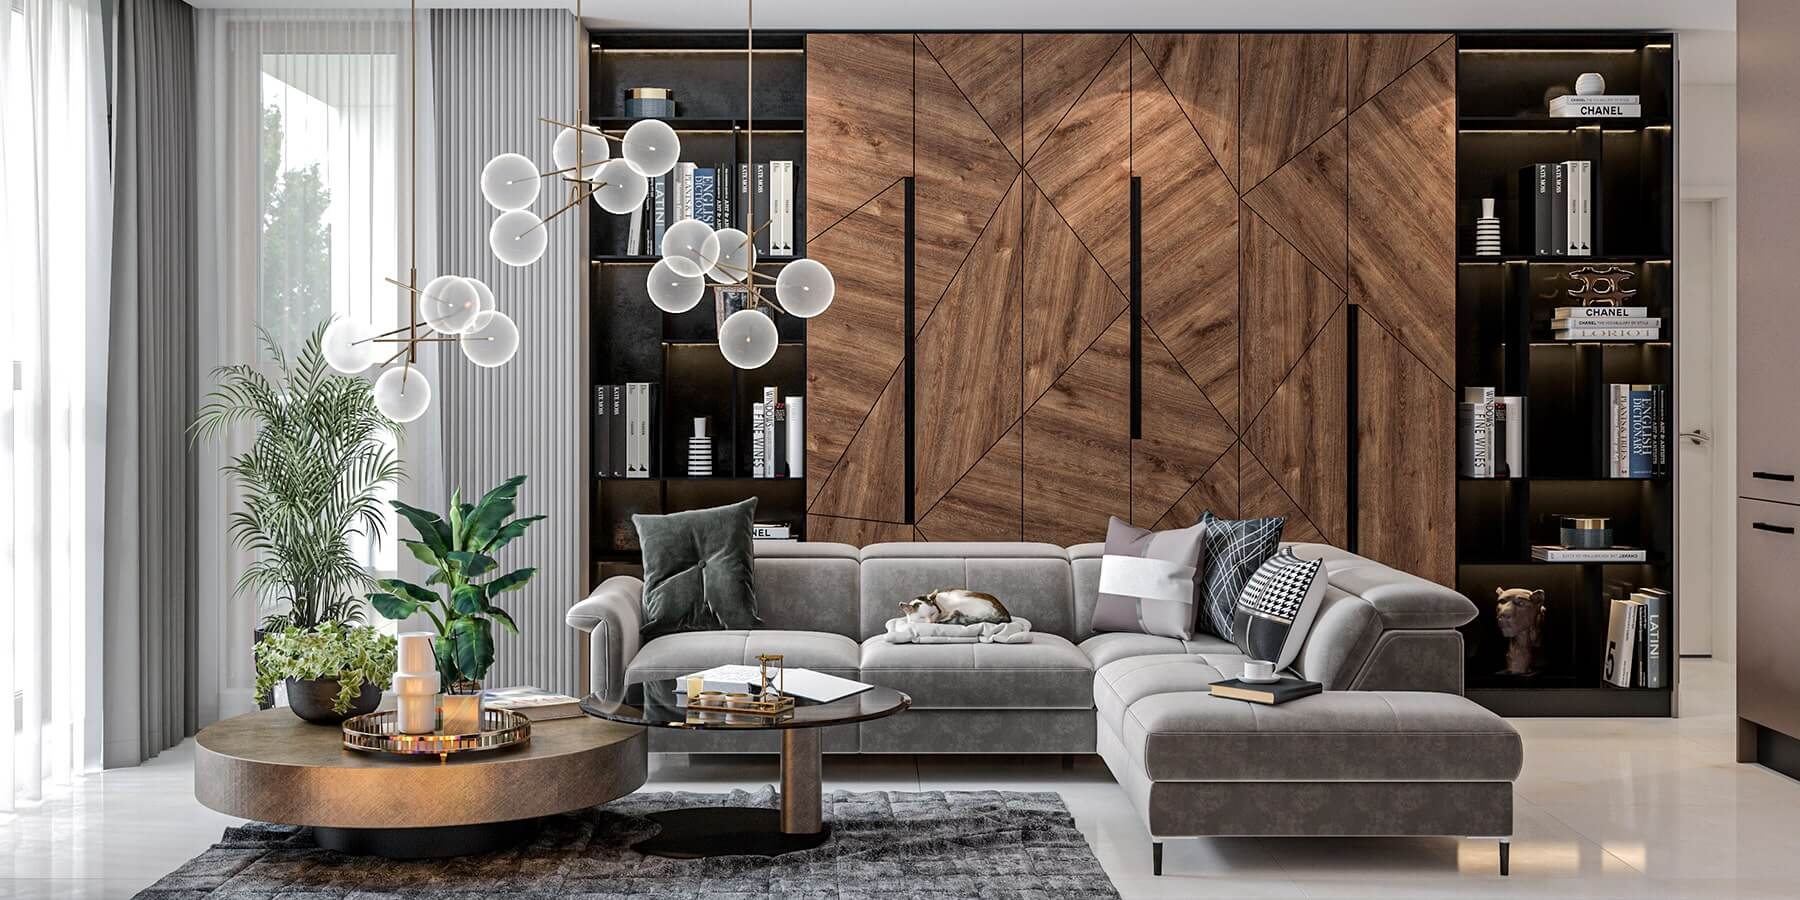 interiorno-studio-za-interioren-dizain-esteta-proektanti-sofia-header